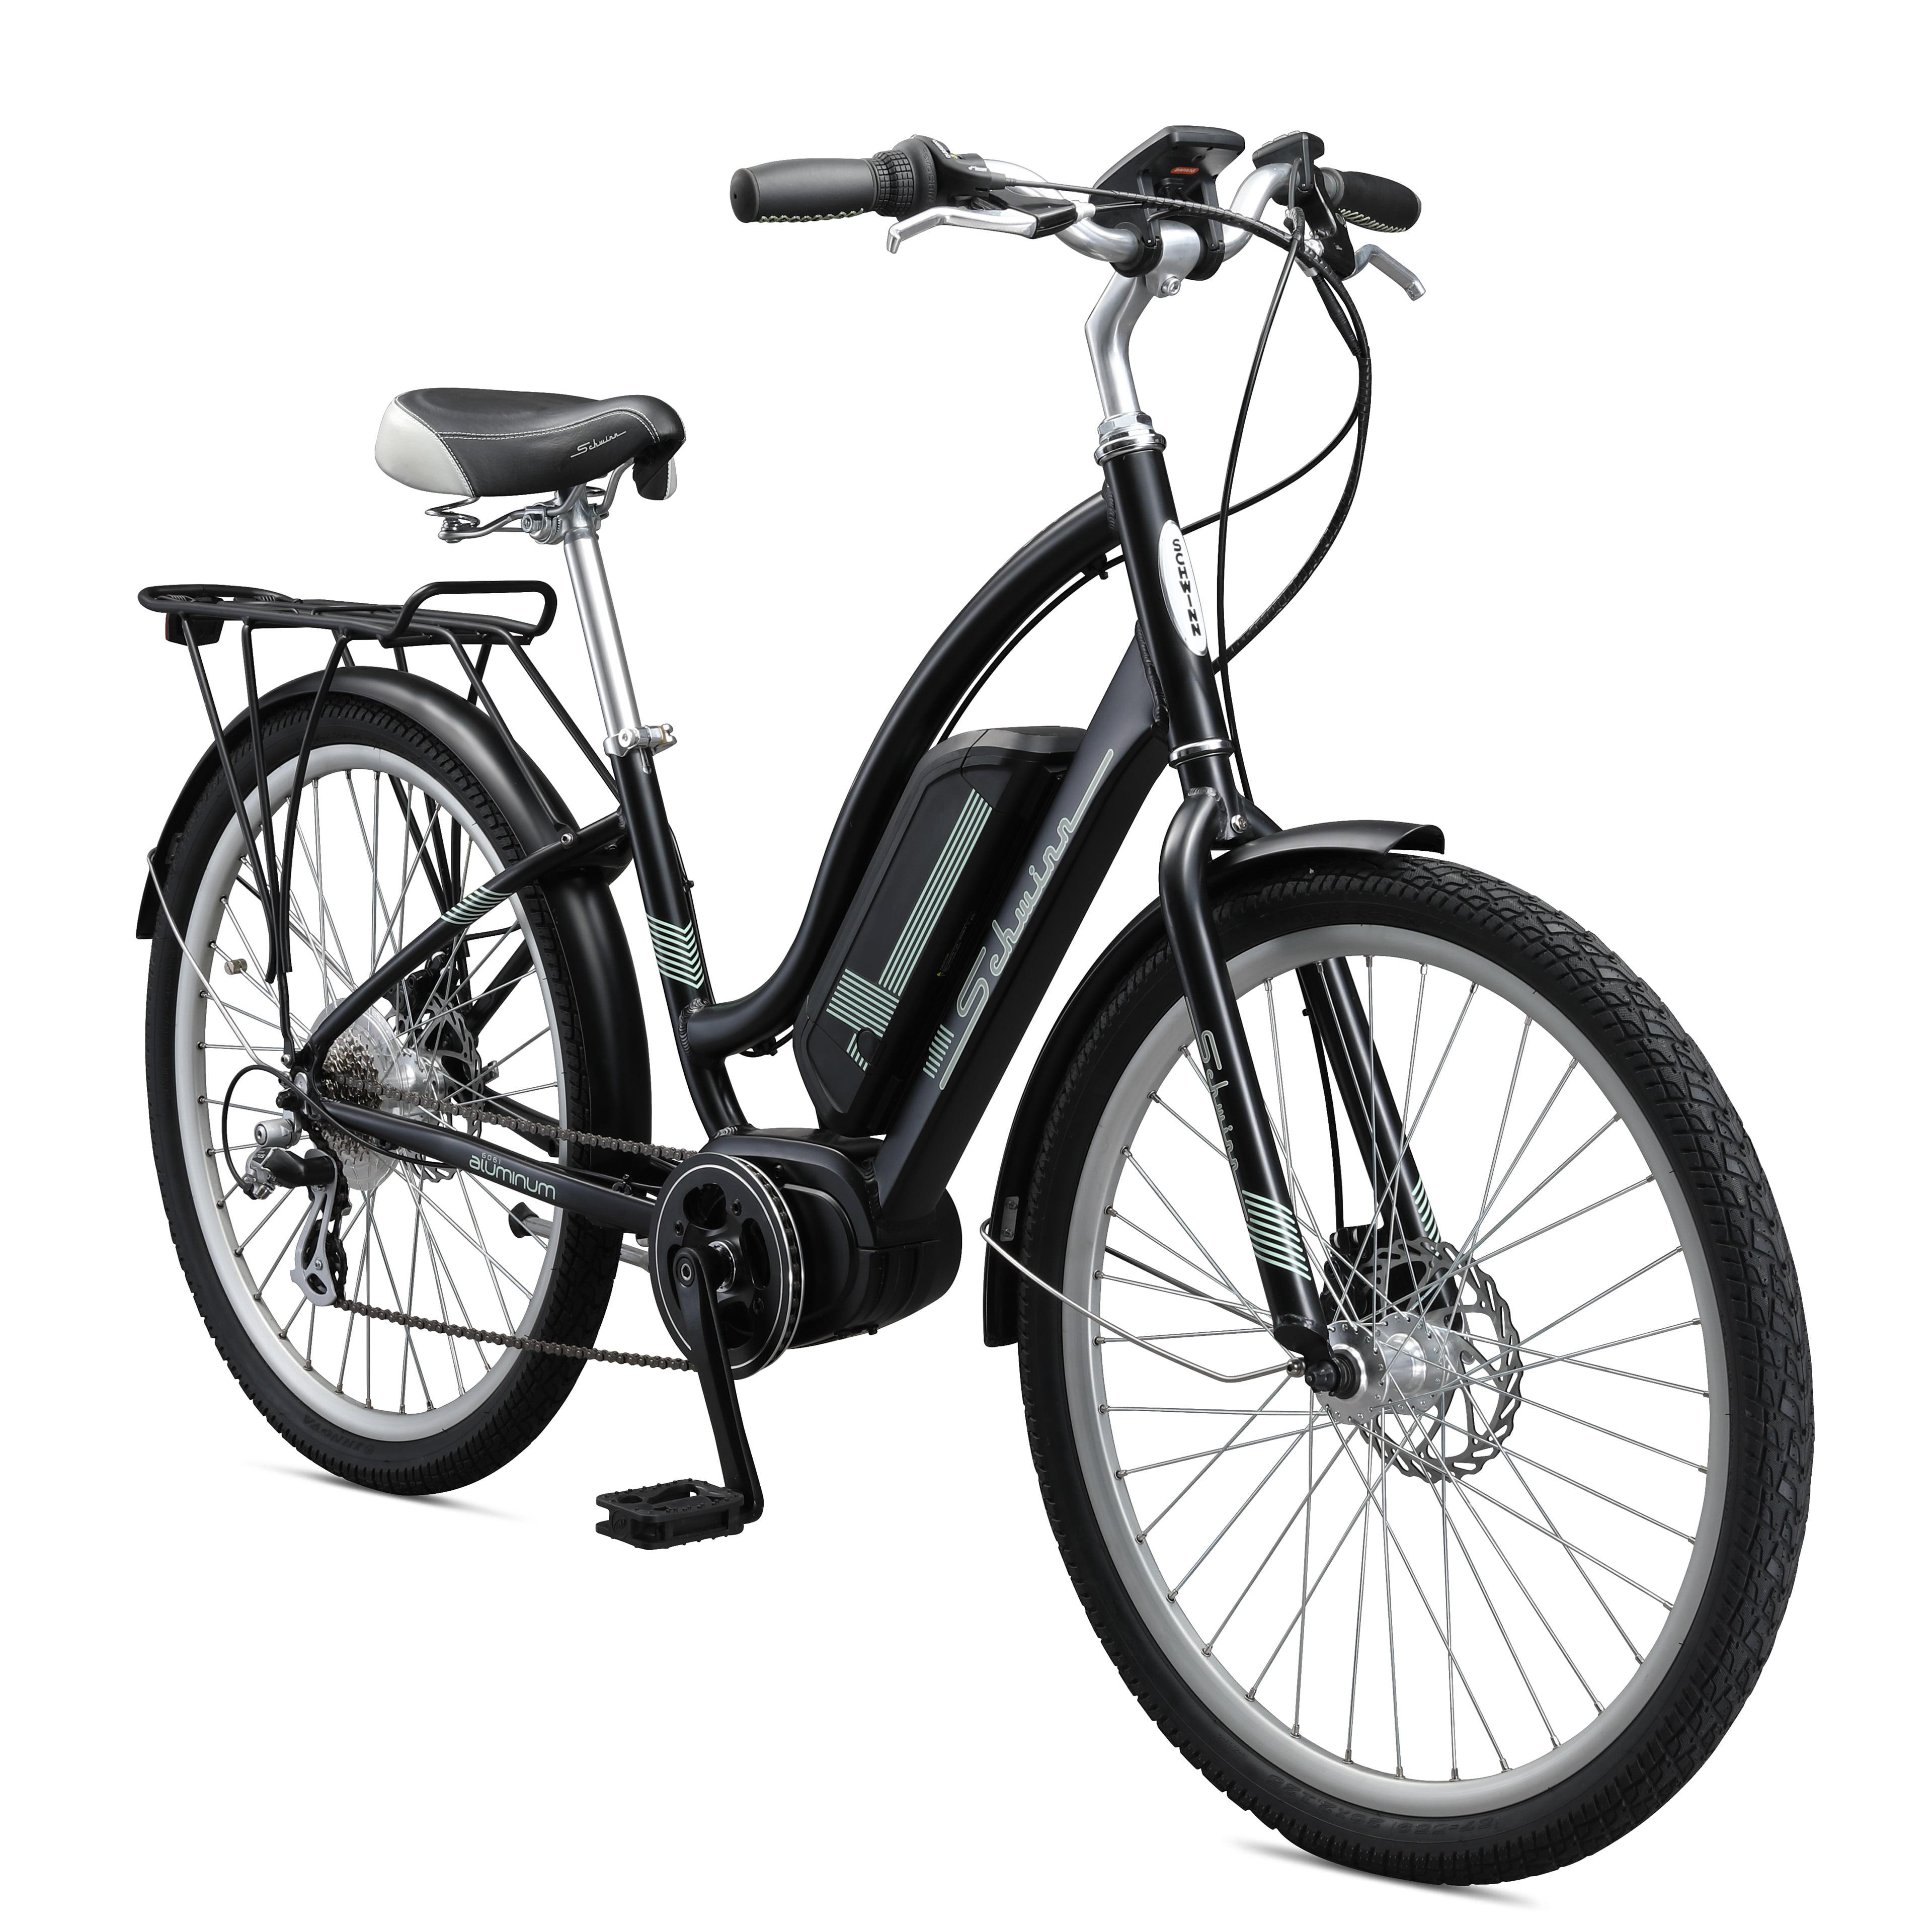 Schwinn Constance 250 watt mid drive cruiser electric bicycle, 7 speeds, Mens/Womens, one size